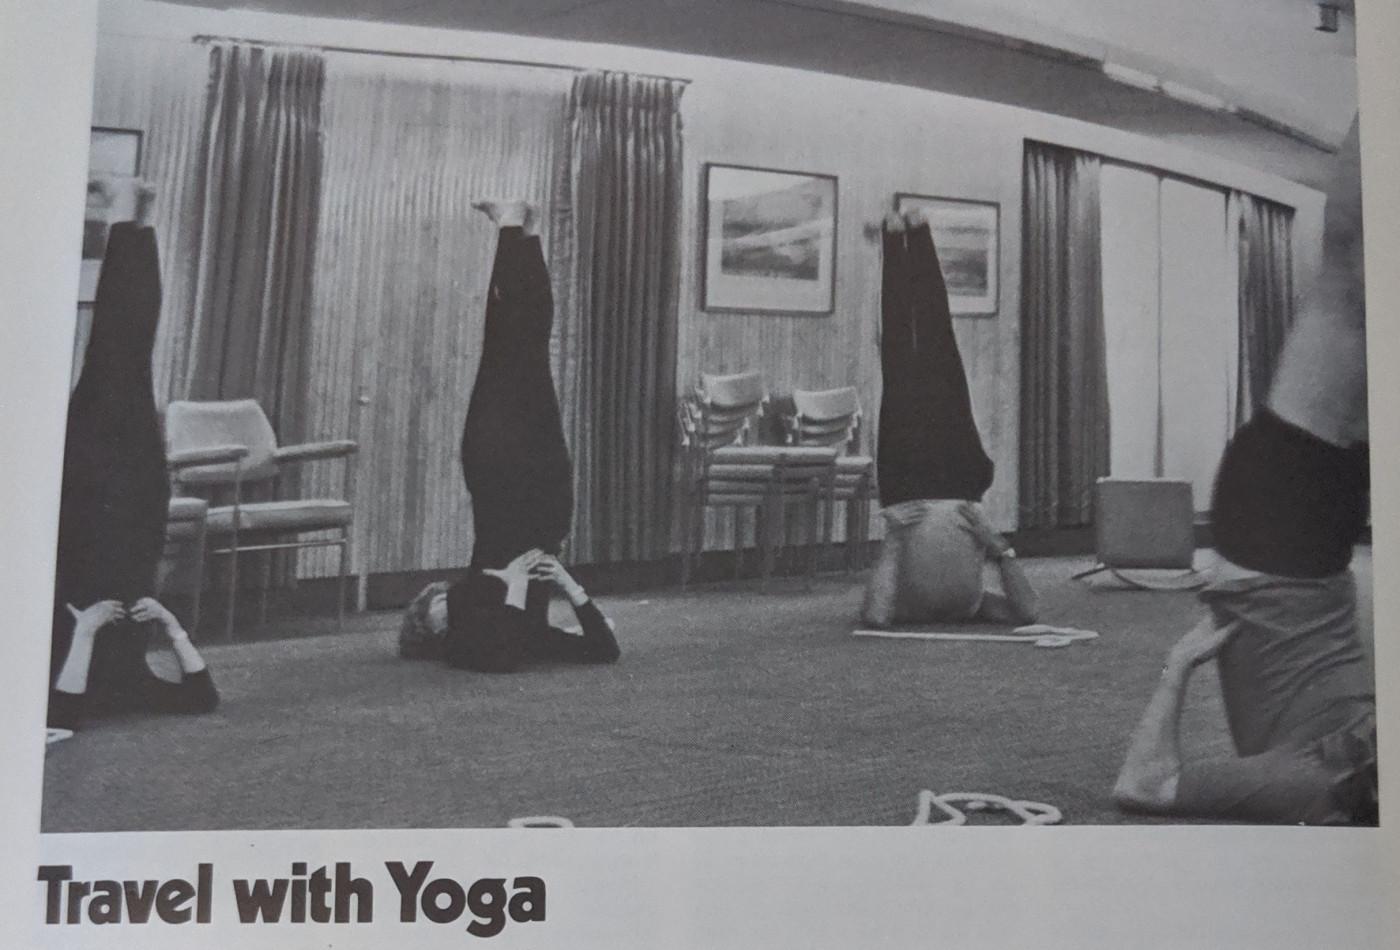 The Yoga Club goes abroad, Society magazine 1982